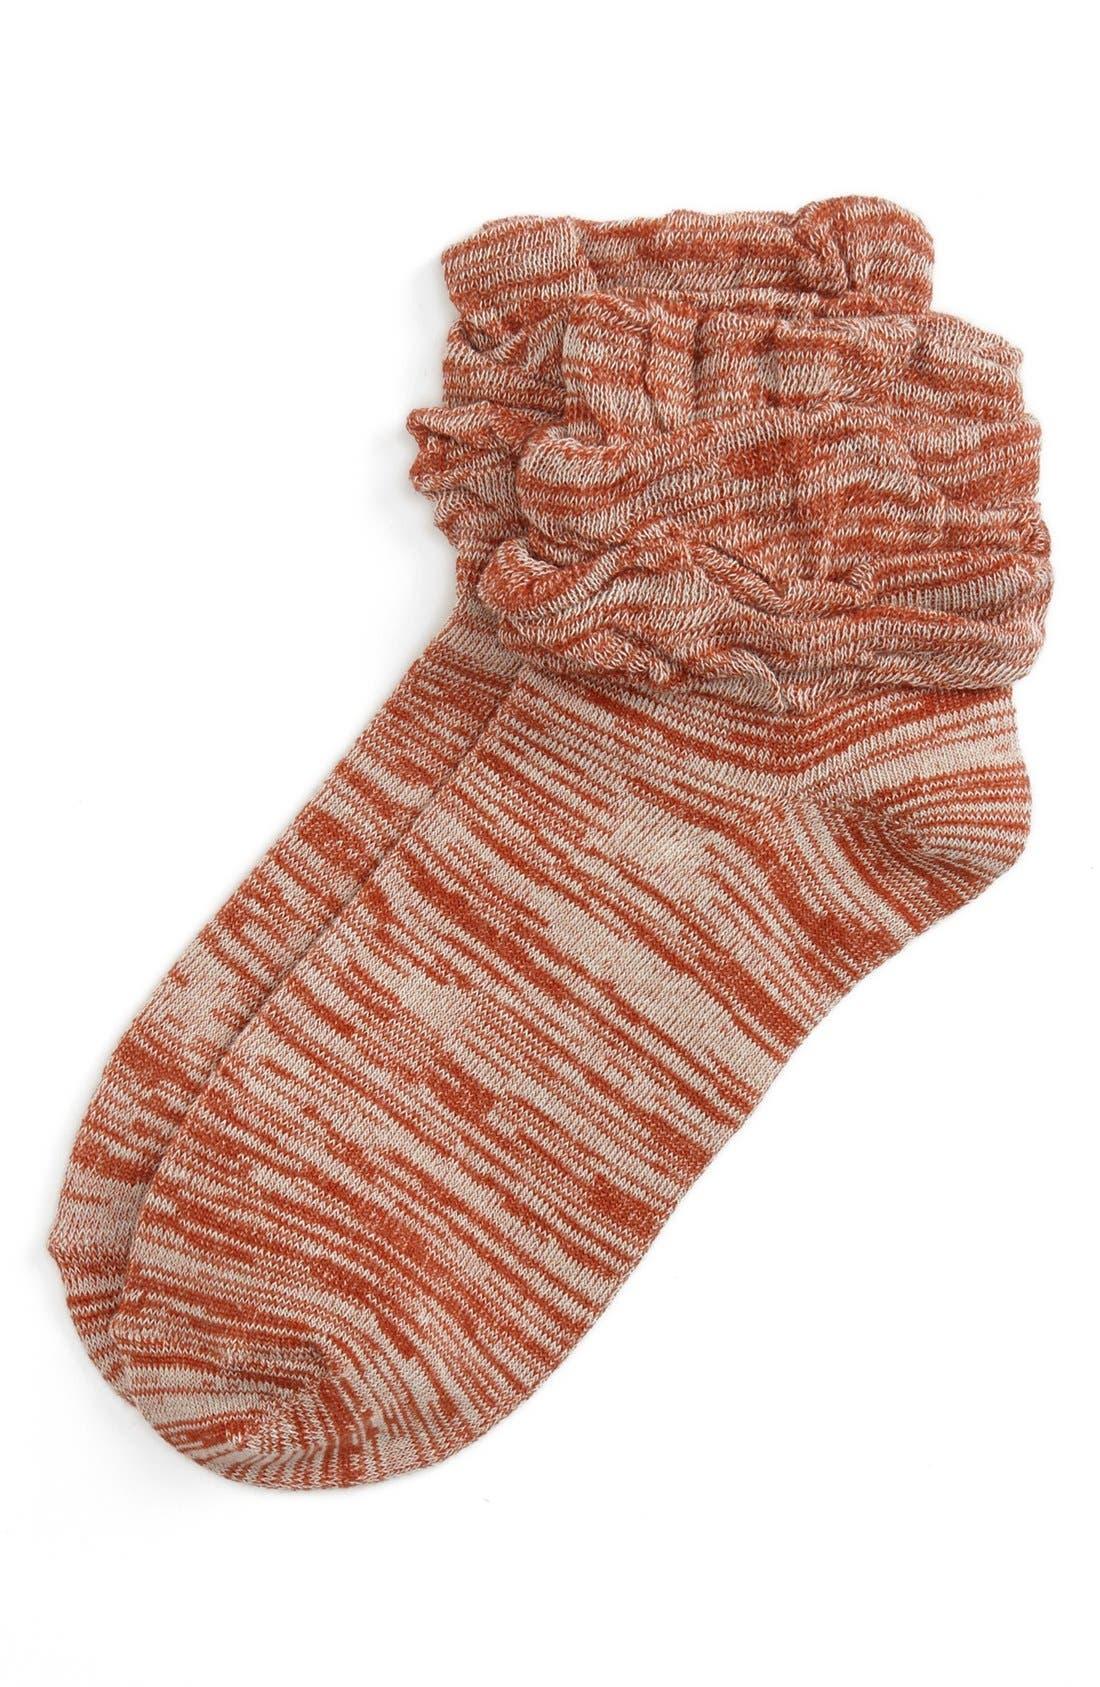 Alternate Image 1 Selected - BP. Marled Bootie Socks (Juniors)